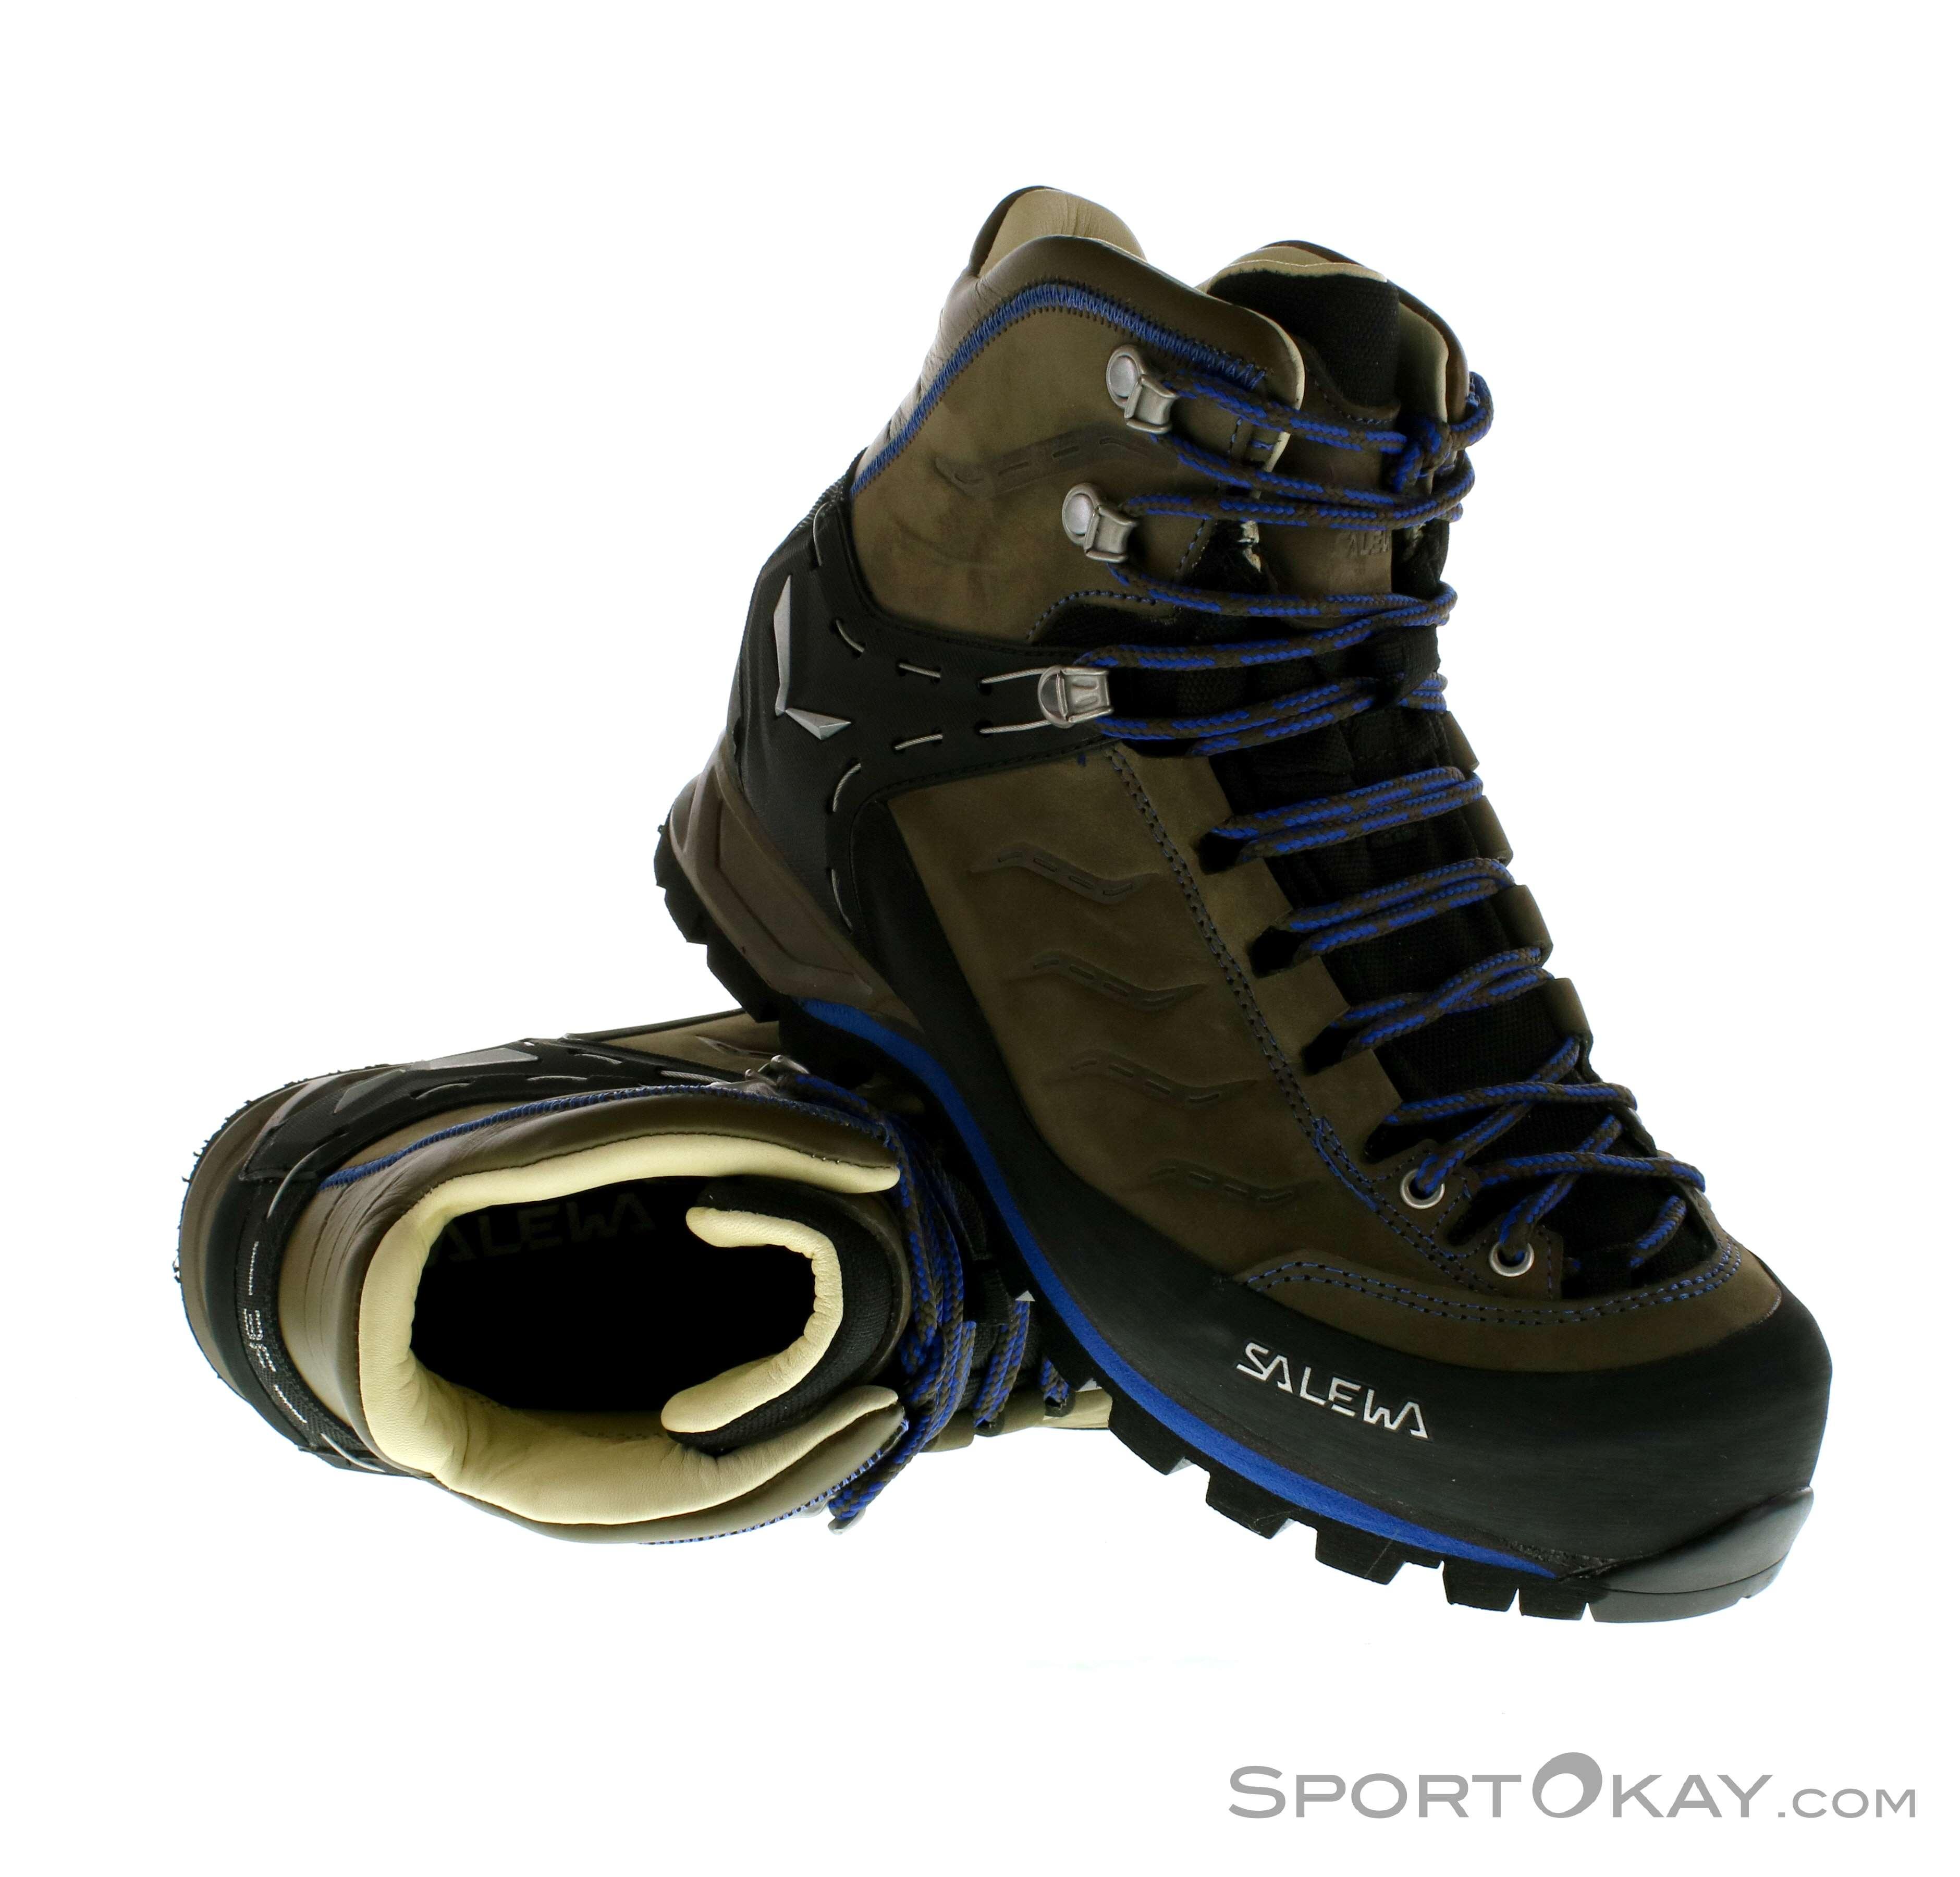 Salewa MS MTN Trainer MId L Mens Hiking Boots - Hiking Boots - Shoes ... 45ae7f252af